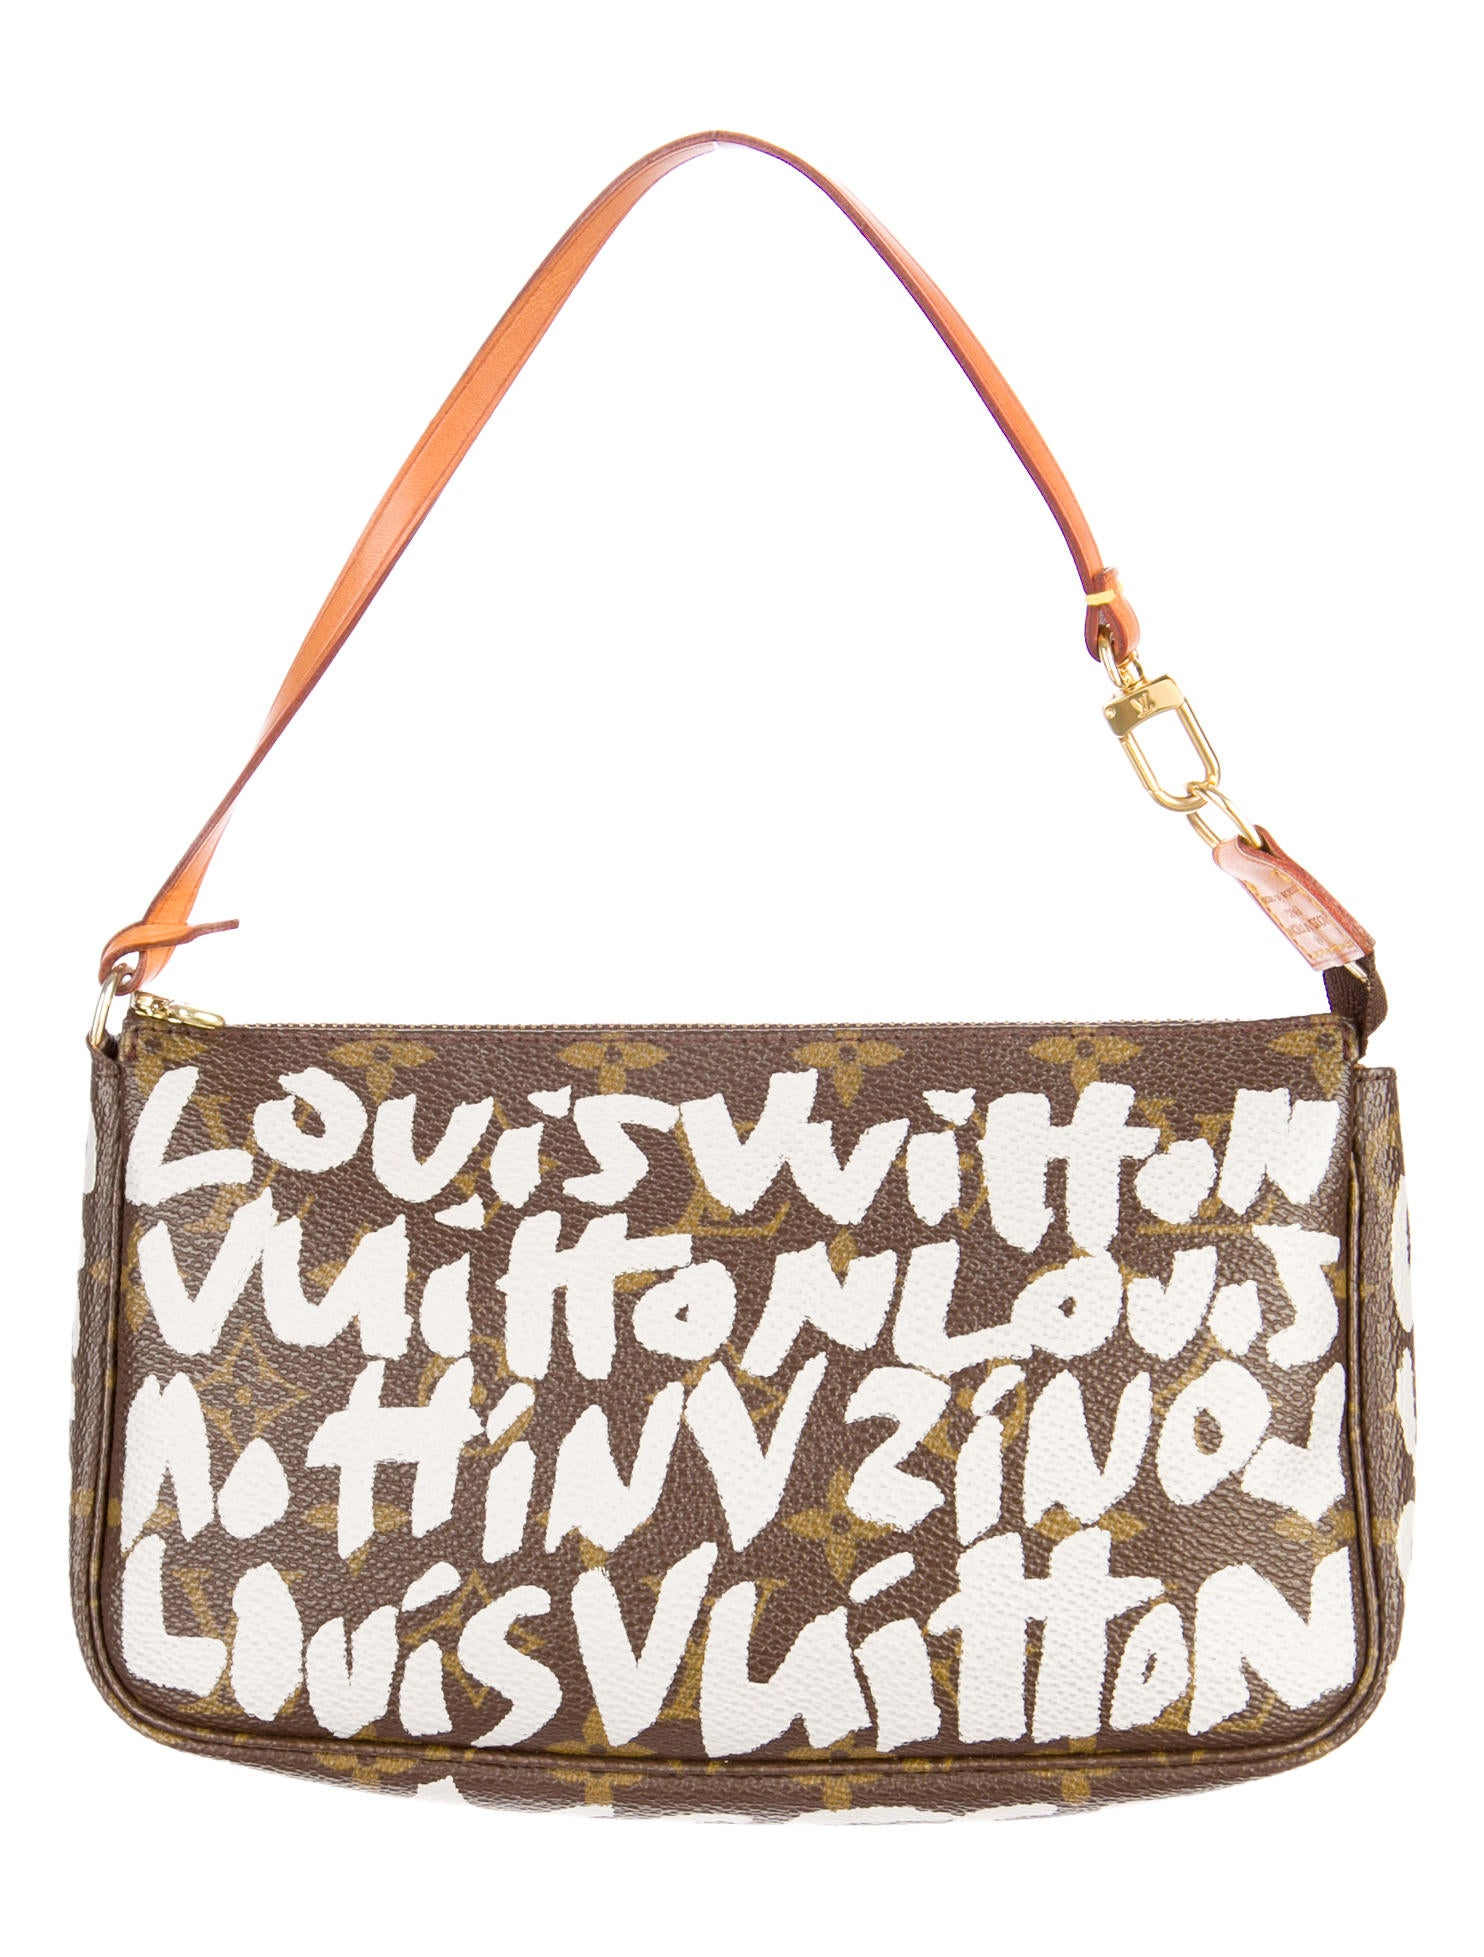 e6fa83583b90 Louis Vuitton Graffiti Pochette Accessoires - Handbags - LOU32918 ...